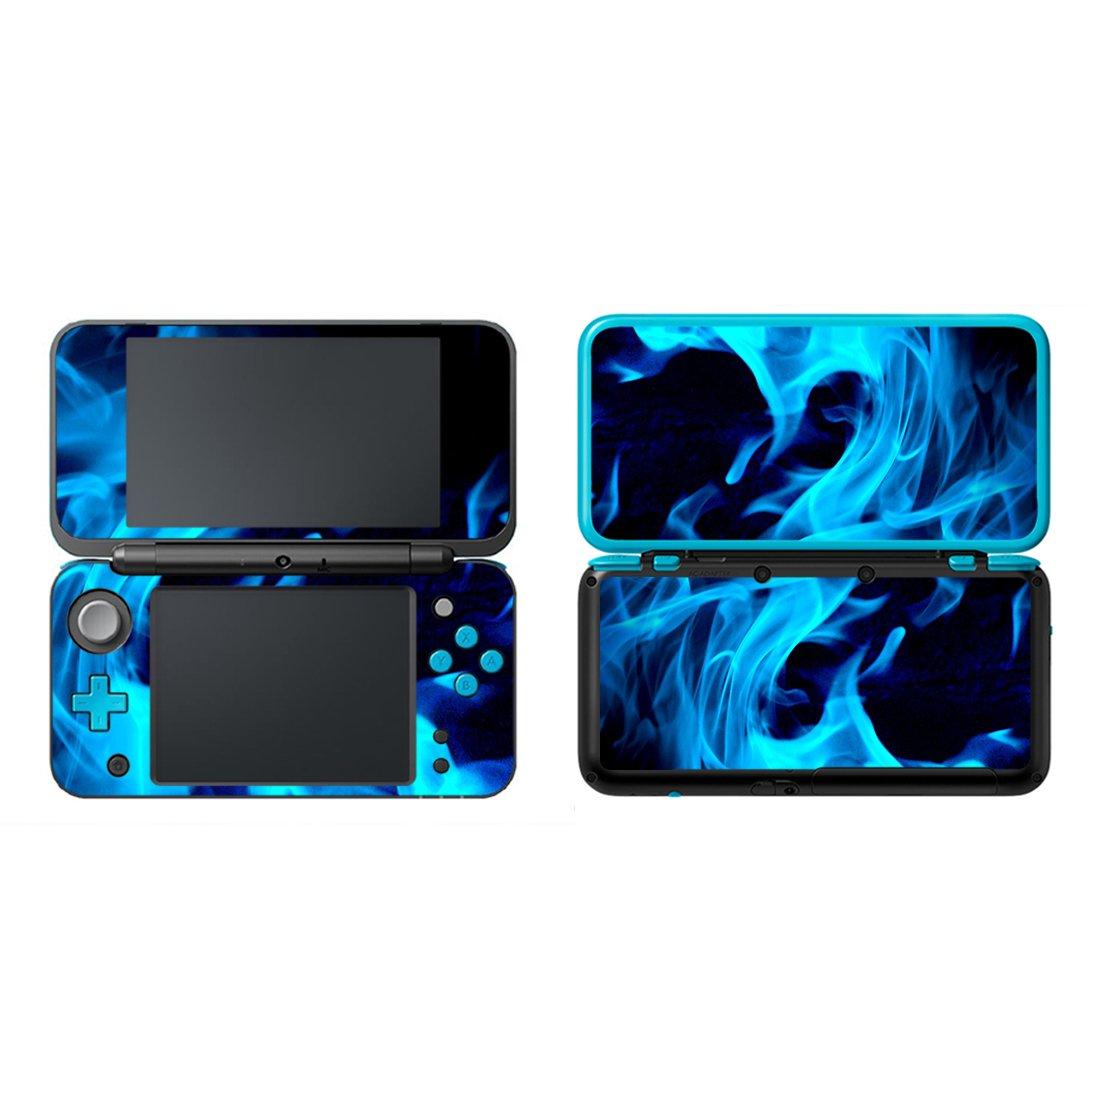 FOTTCZ Vinyl Cover Decals Skin Sticker for New Nintendo 2DS XL/LL - Ice Blue Blaze